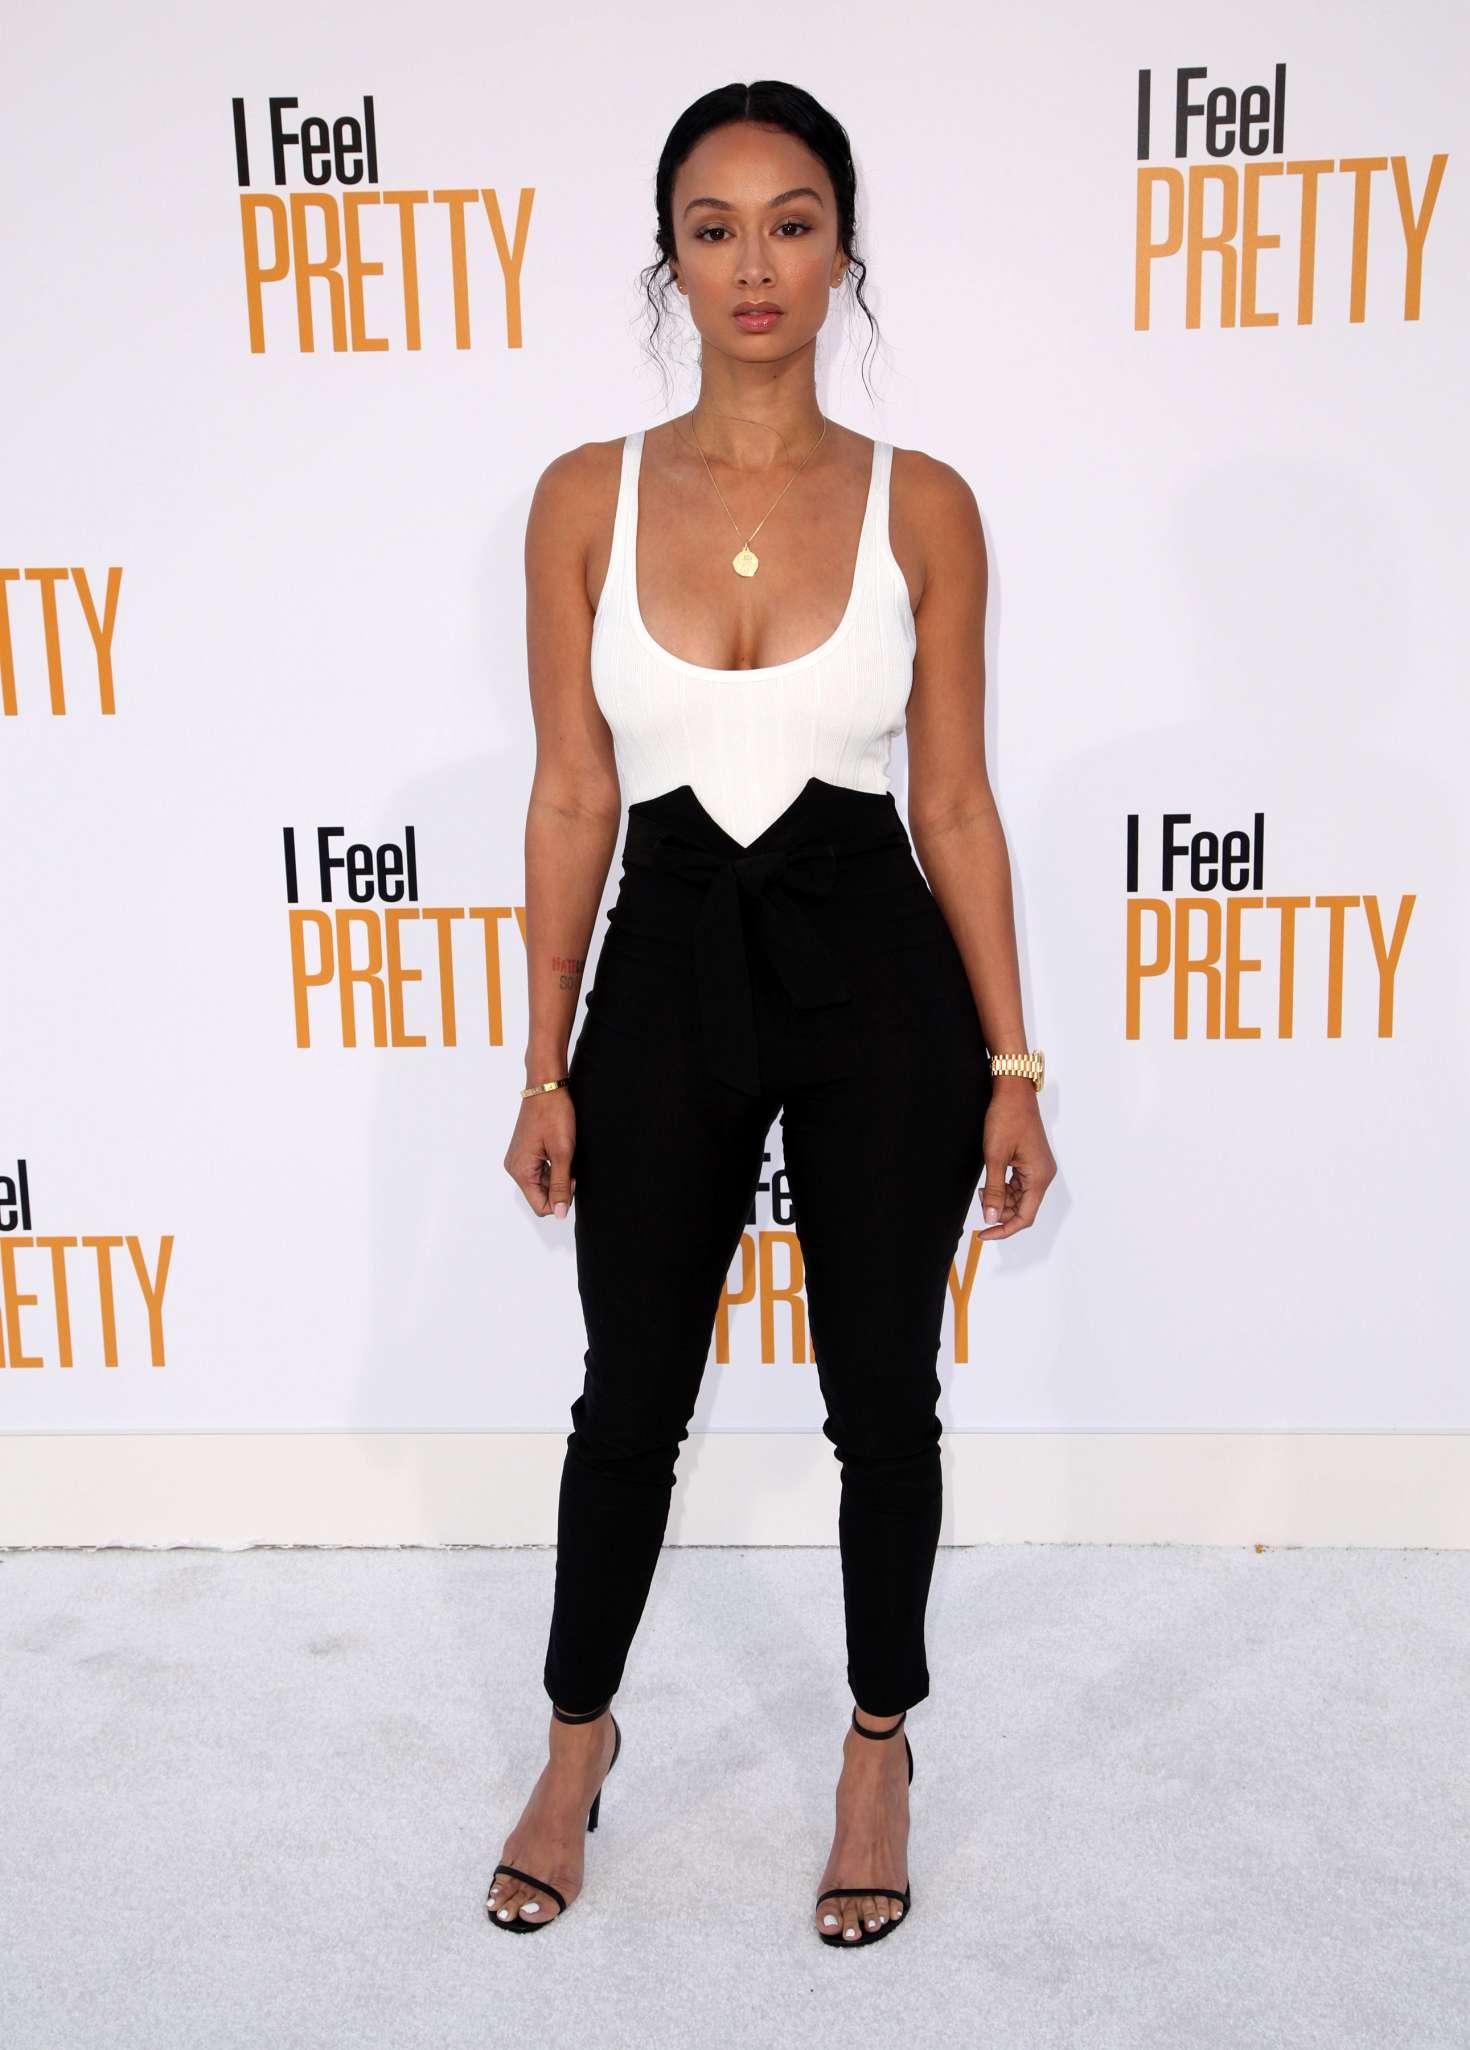 Draya Michele 2018 : Draya Michele: I Feel Pretty Premiere -03